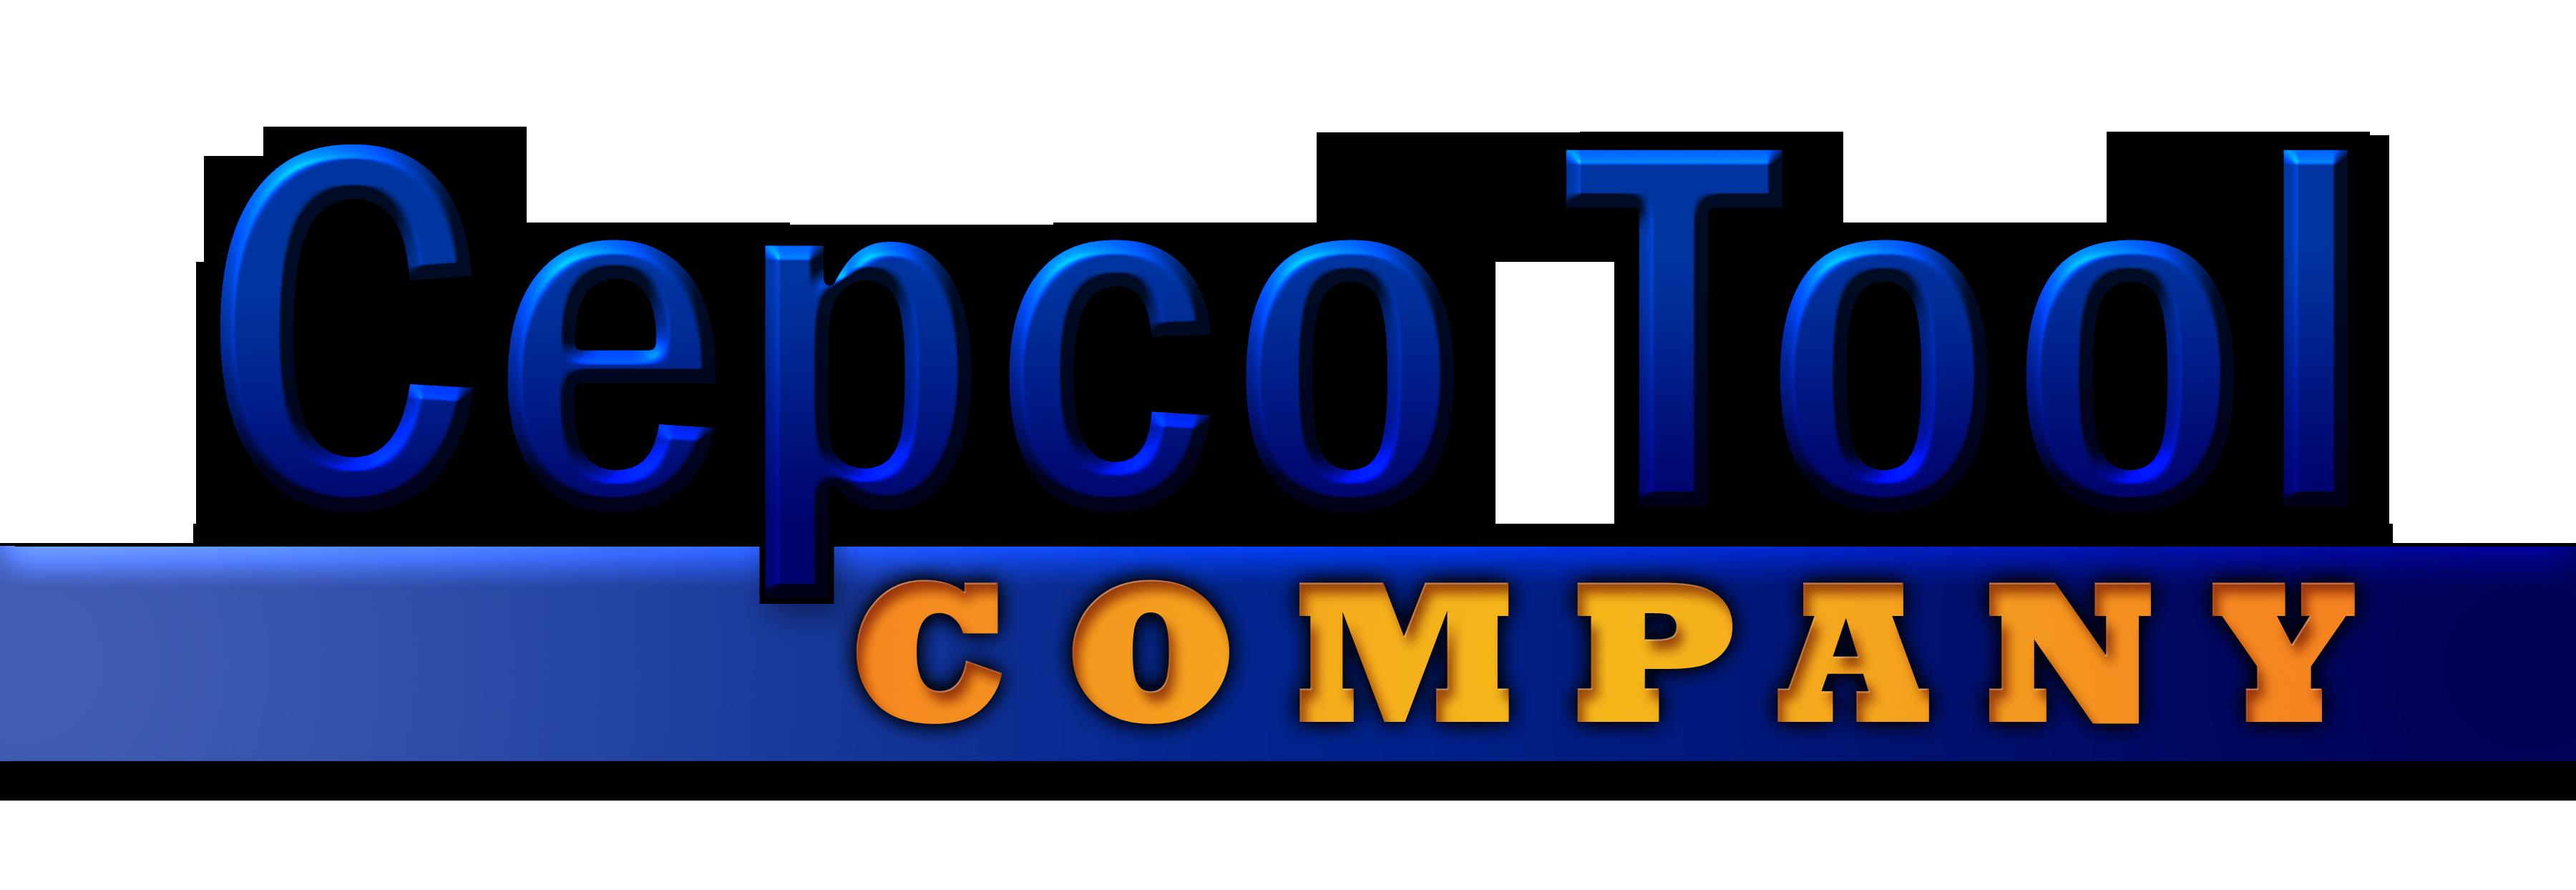 Cepco Tool Company